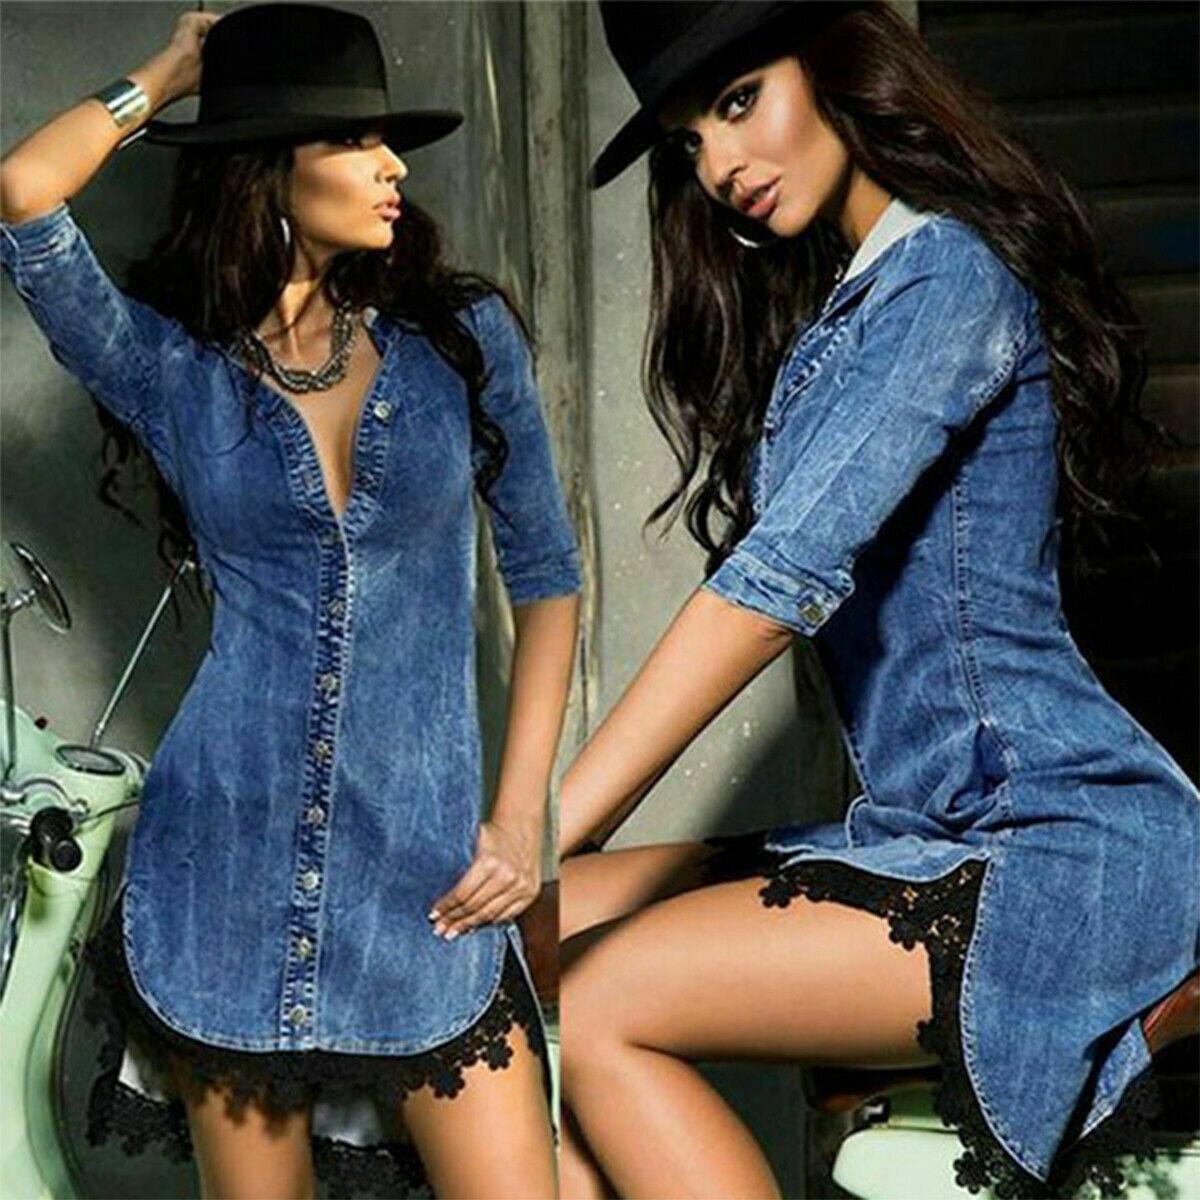 THE JENNIFER DRESS Dark Wash Blue Stretchy Jean Button Down 3/4 Sleeve High Low Black Lace Trim Collar Sheath Short Dress